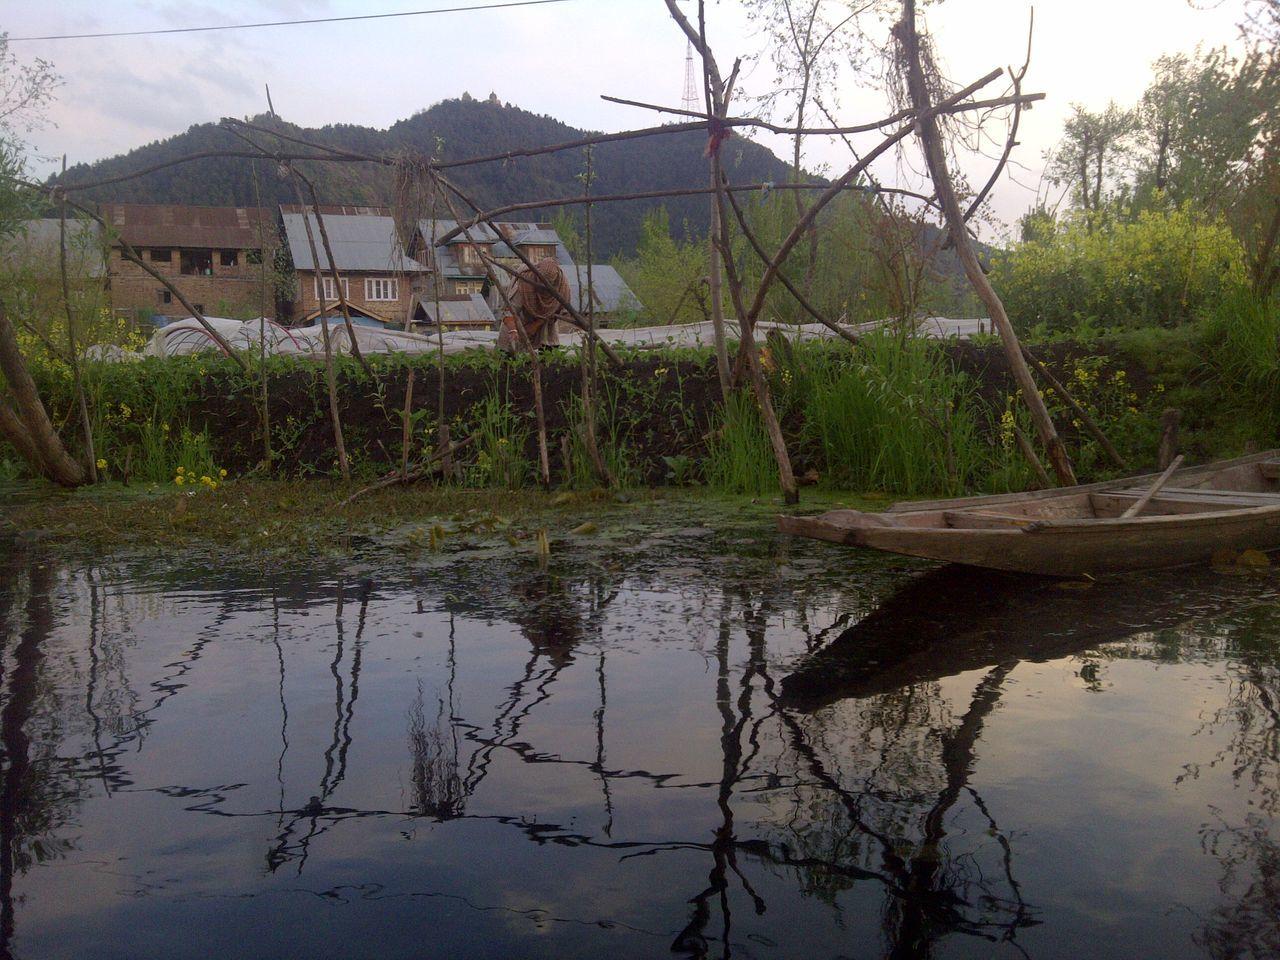 Beauty In Nature Day Idyllic Kashmir Kashmirdiaries Nature No People Outdoors Reflection Rippled Scenics Srinagar  Srinagar Kashmir Tranquil Scene Tranquility Water